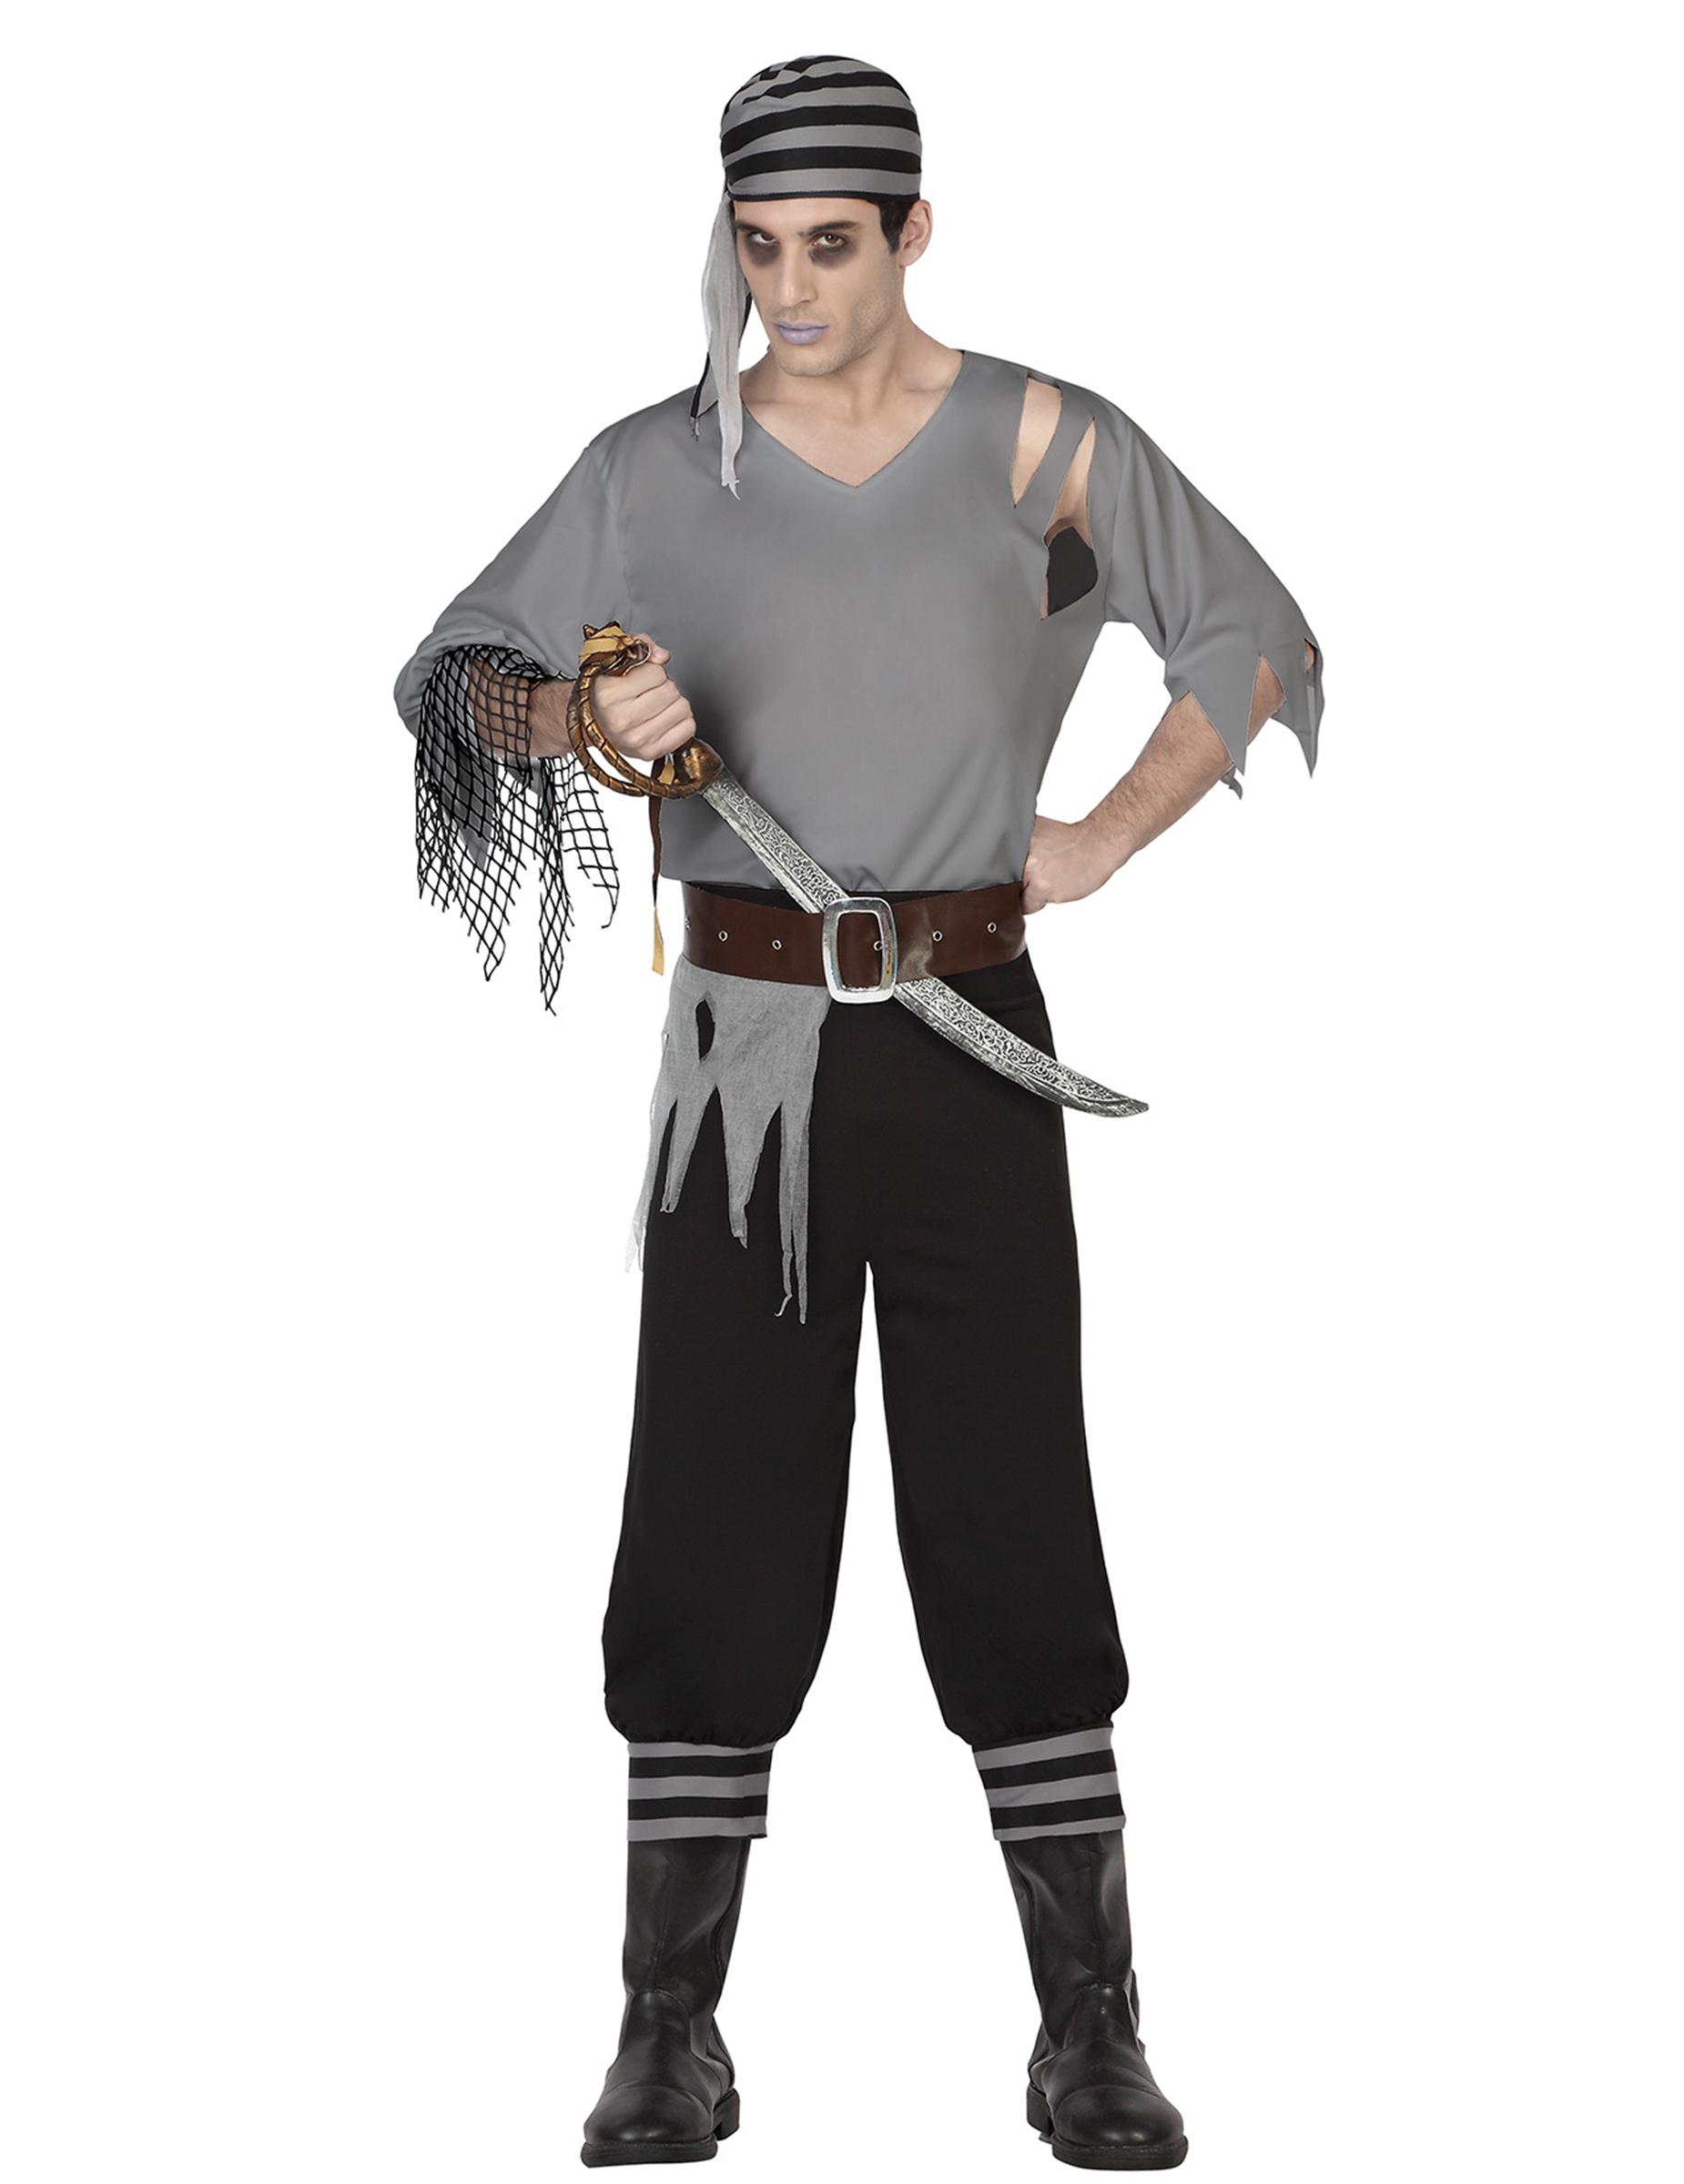 piraten zombie kost m f r herren kost me f r erwachsene und g nstige faschingskost me vegaoo. Black Bedroom Furniture Sets. Home Design Ideas